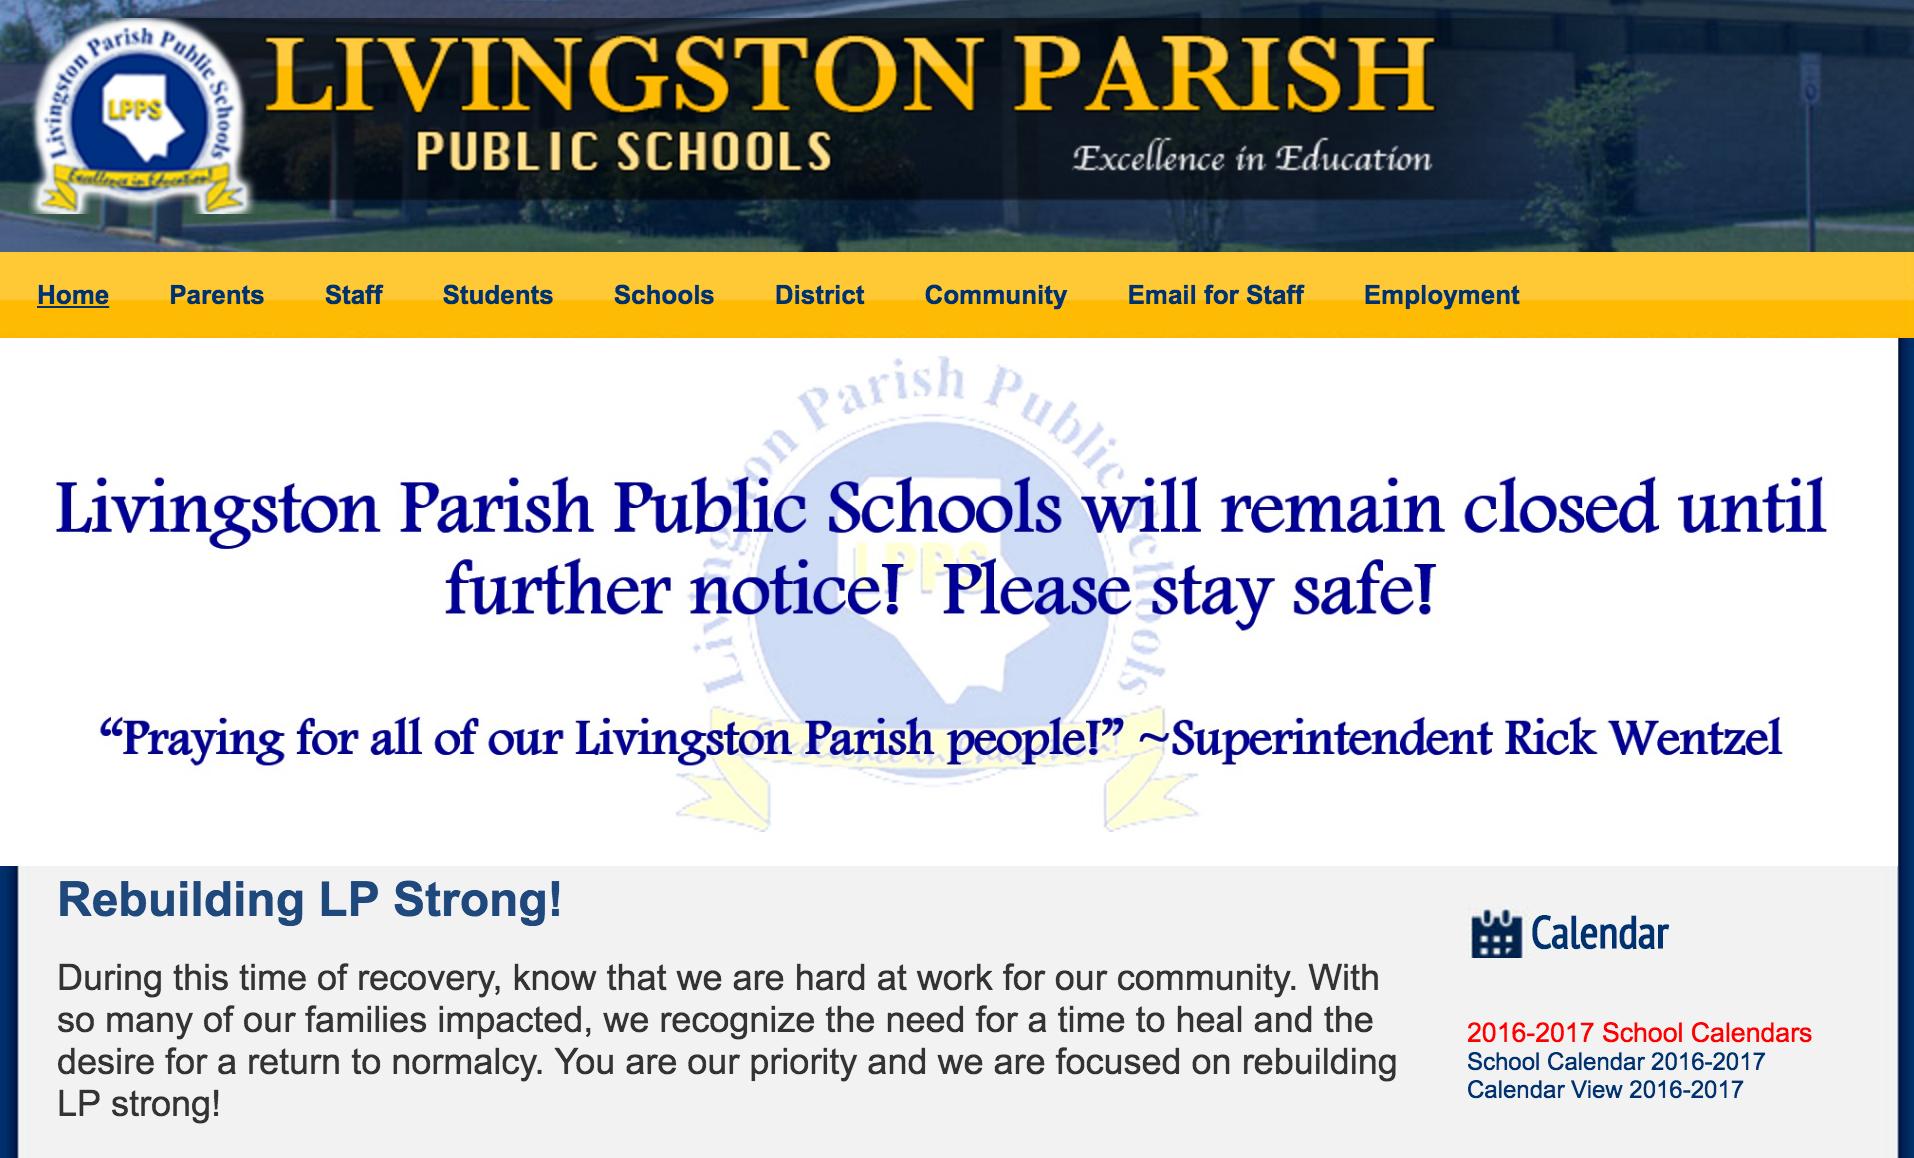 LivingstonParishSchools